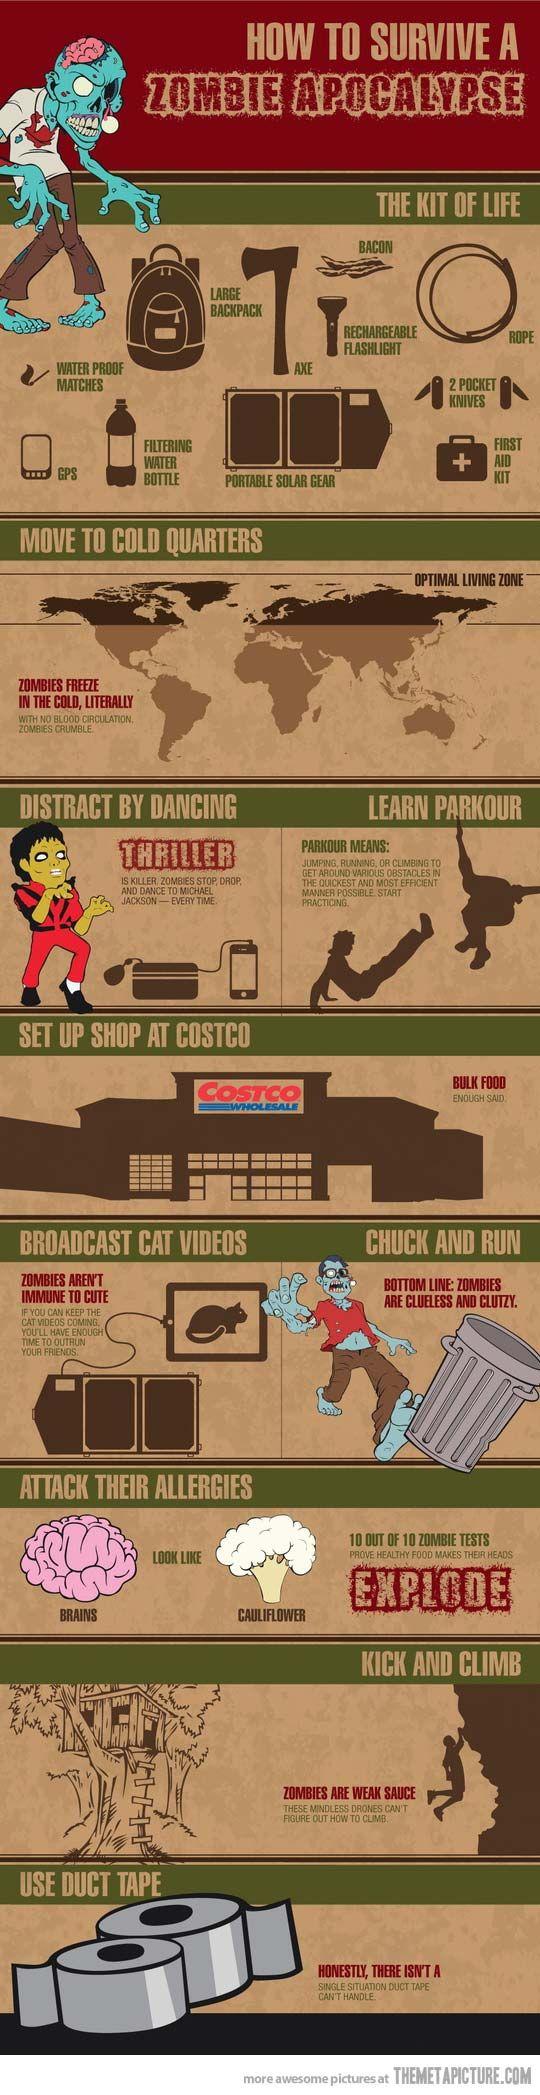 How to survive a zombie apocalypse…